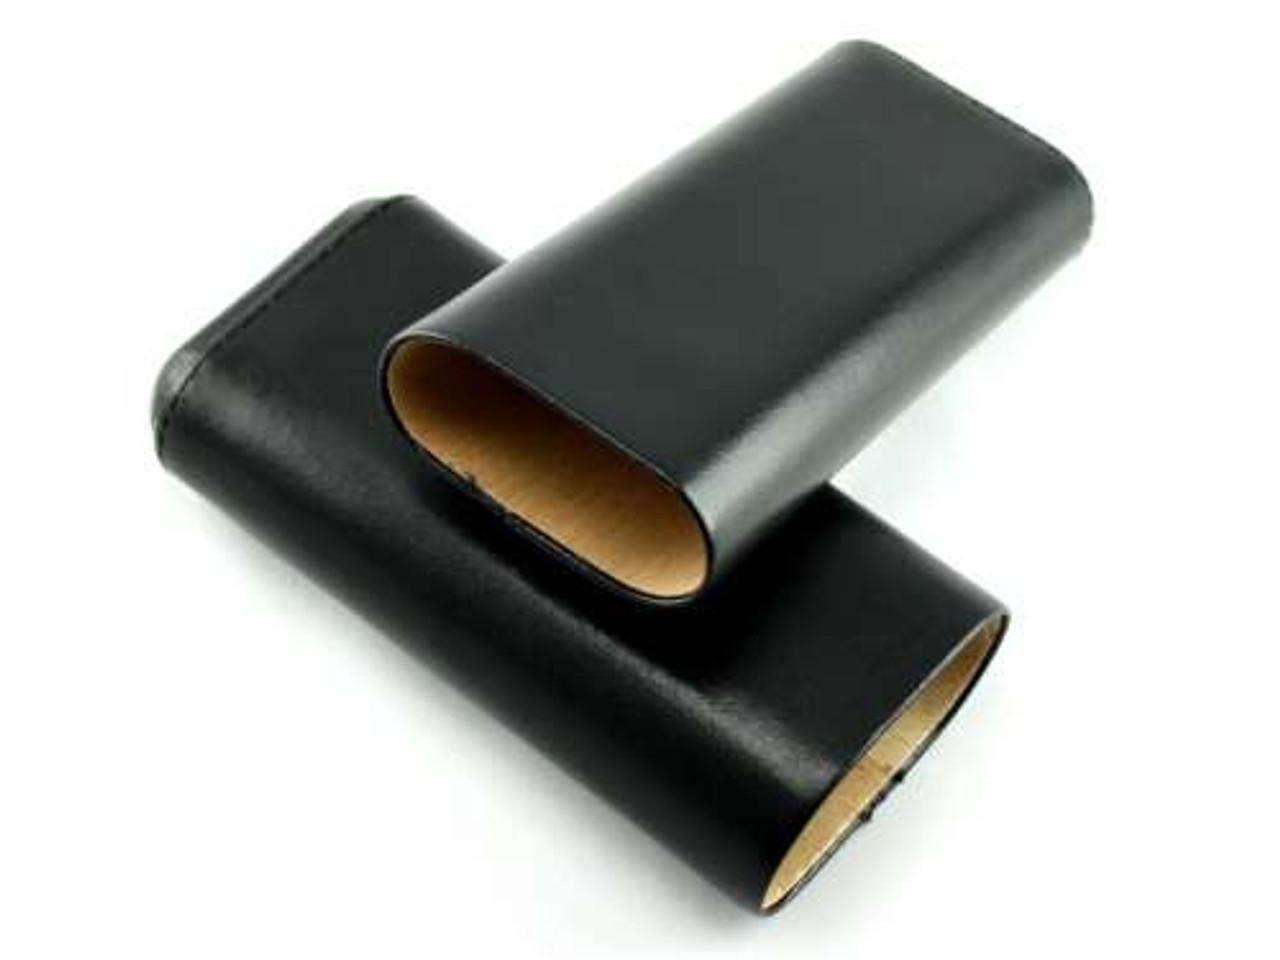 Black Avery Cigar Case